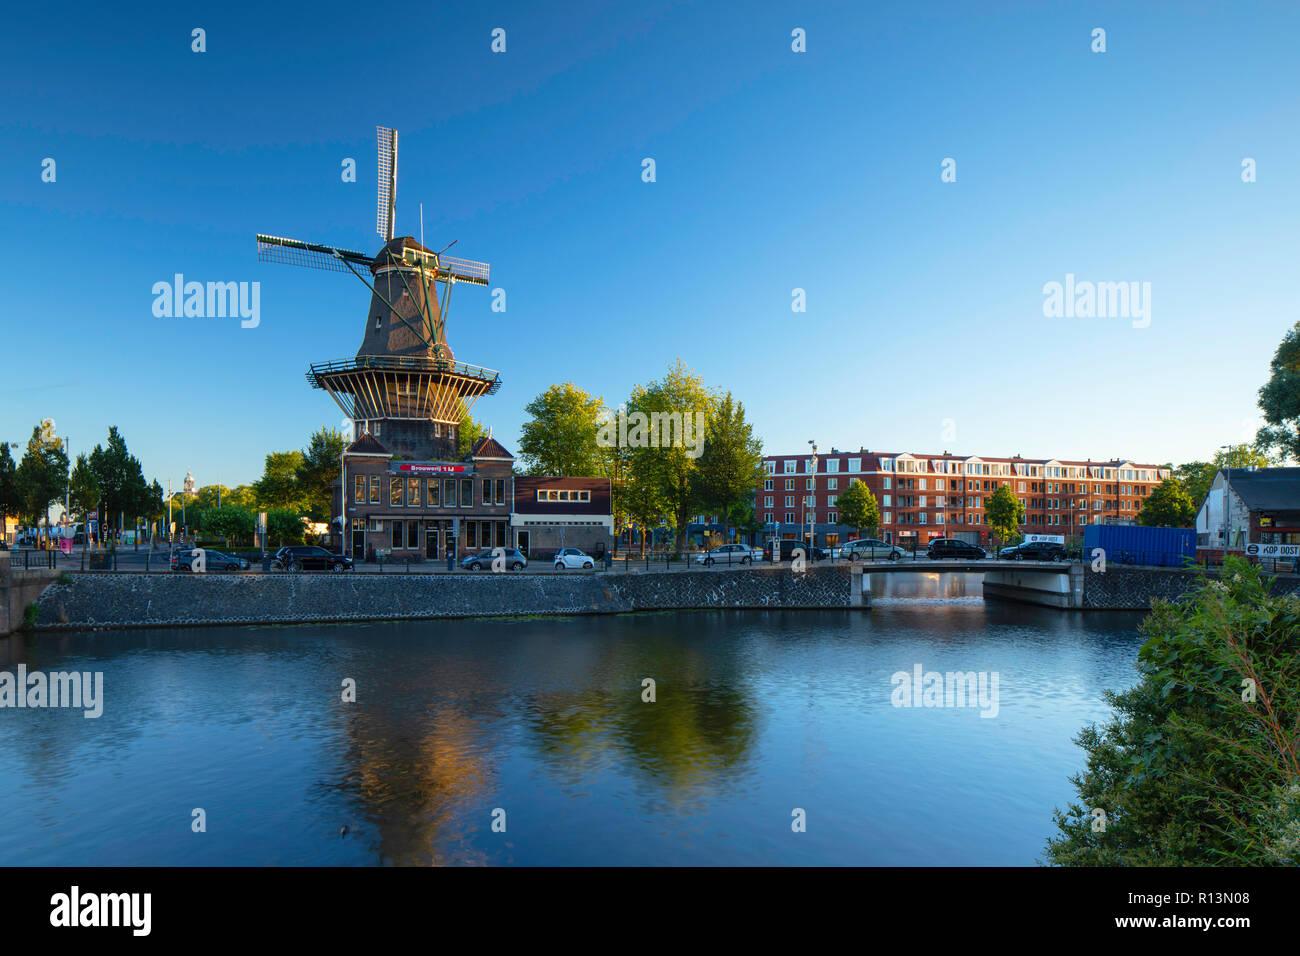 De Gooyer windmil, Amsterdam, Noord Holland, Niederlande Stockbild